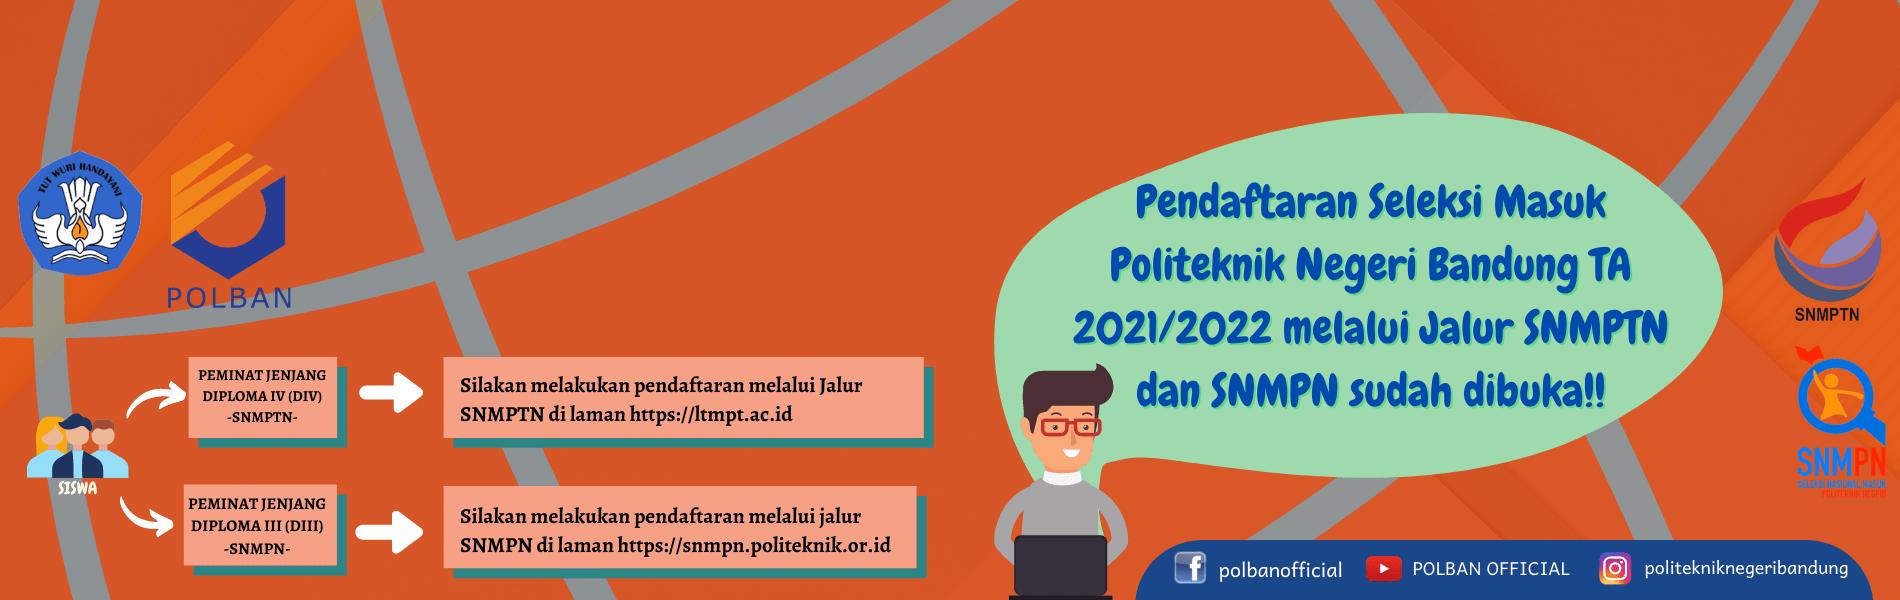 #SNMPTN #SNMPN #POLBAN